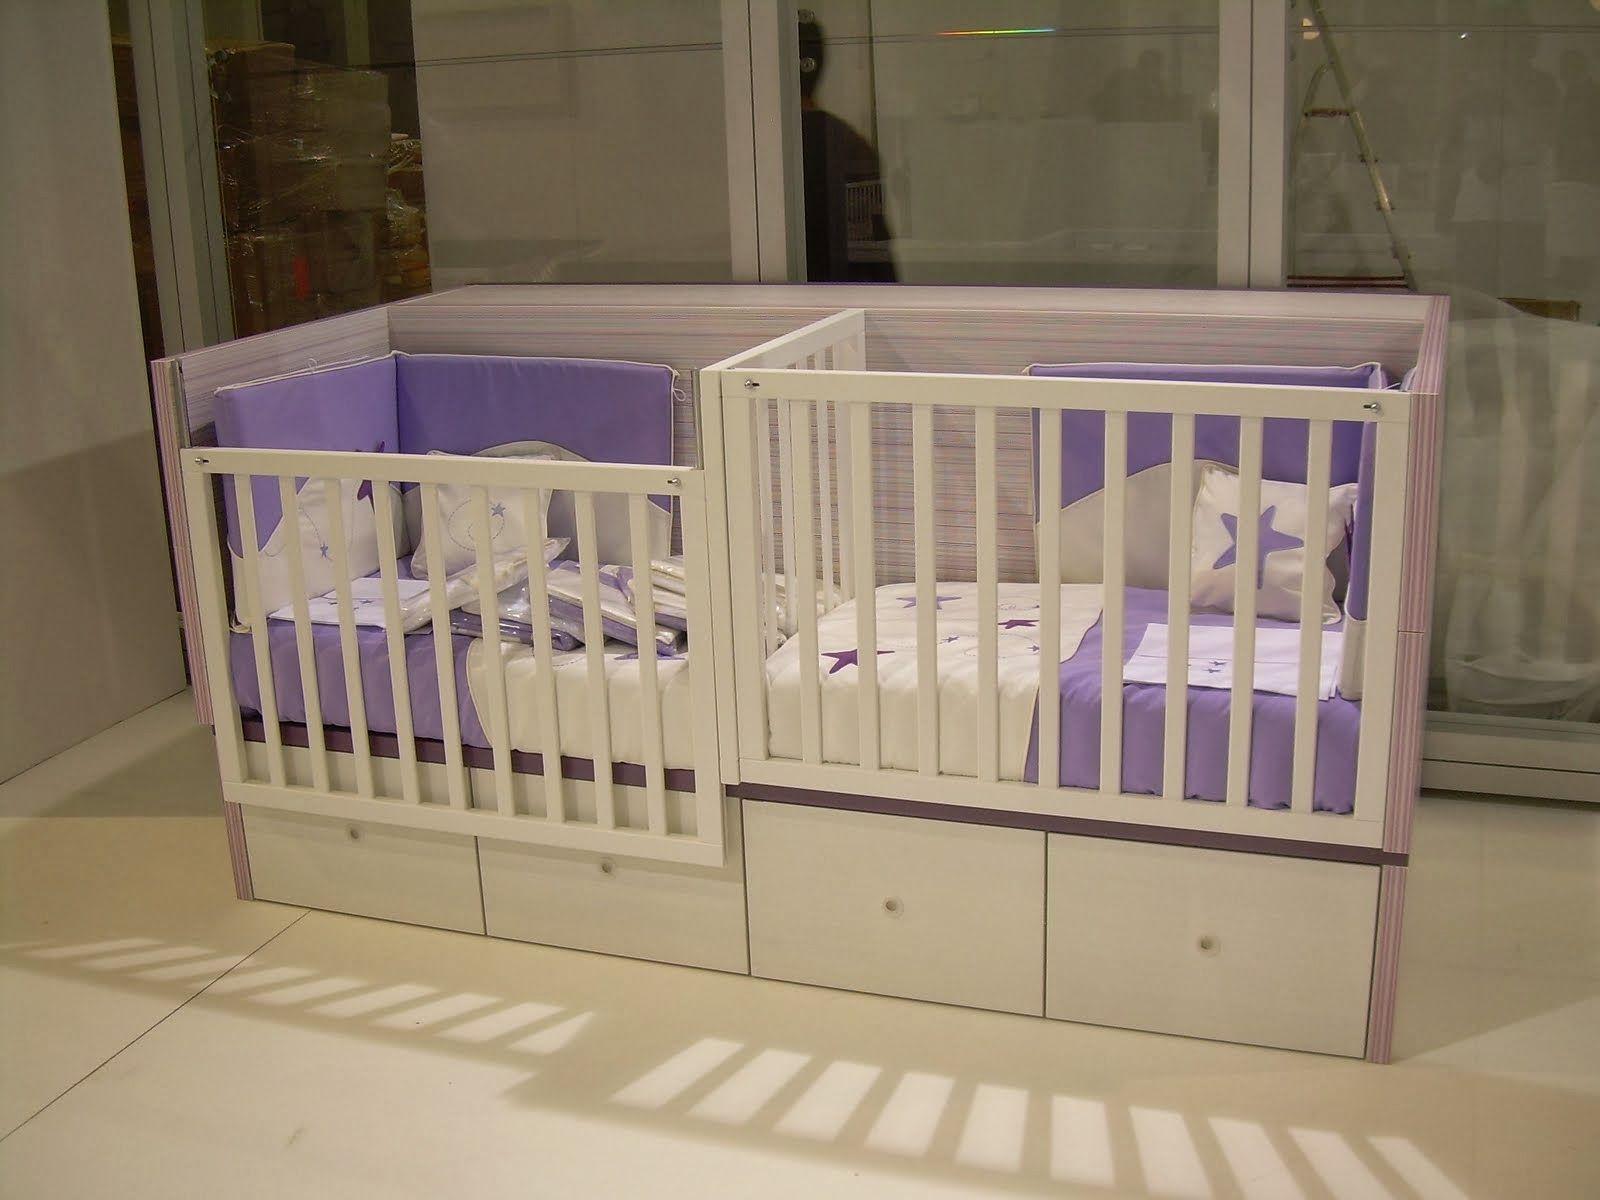 babykamers | Twin baby beds, Twin babies nursery, Nursery ...